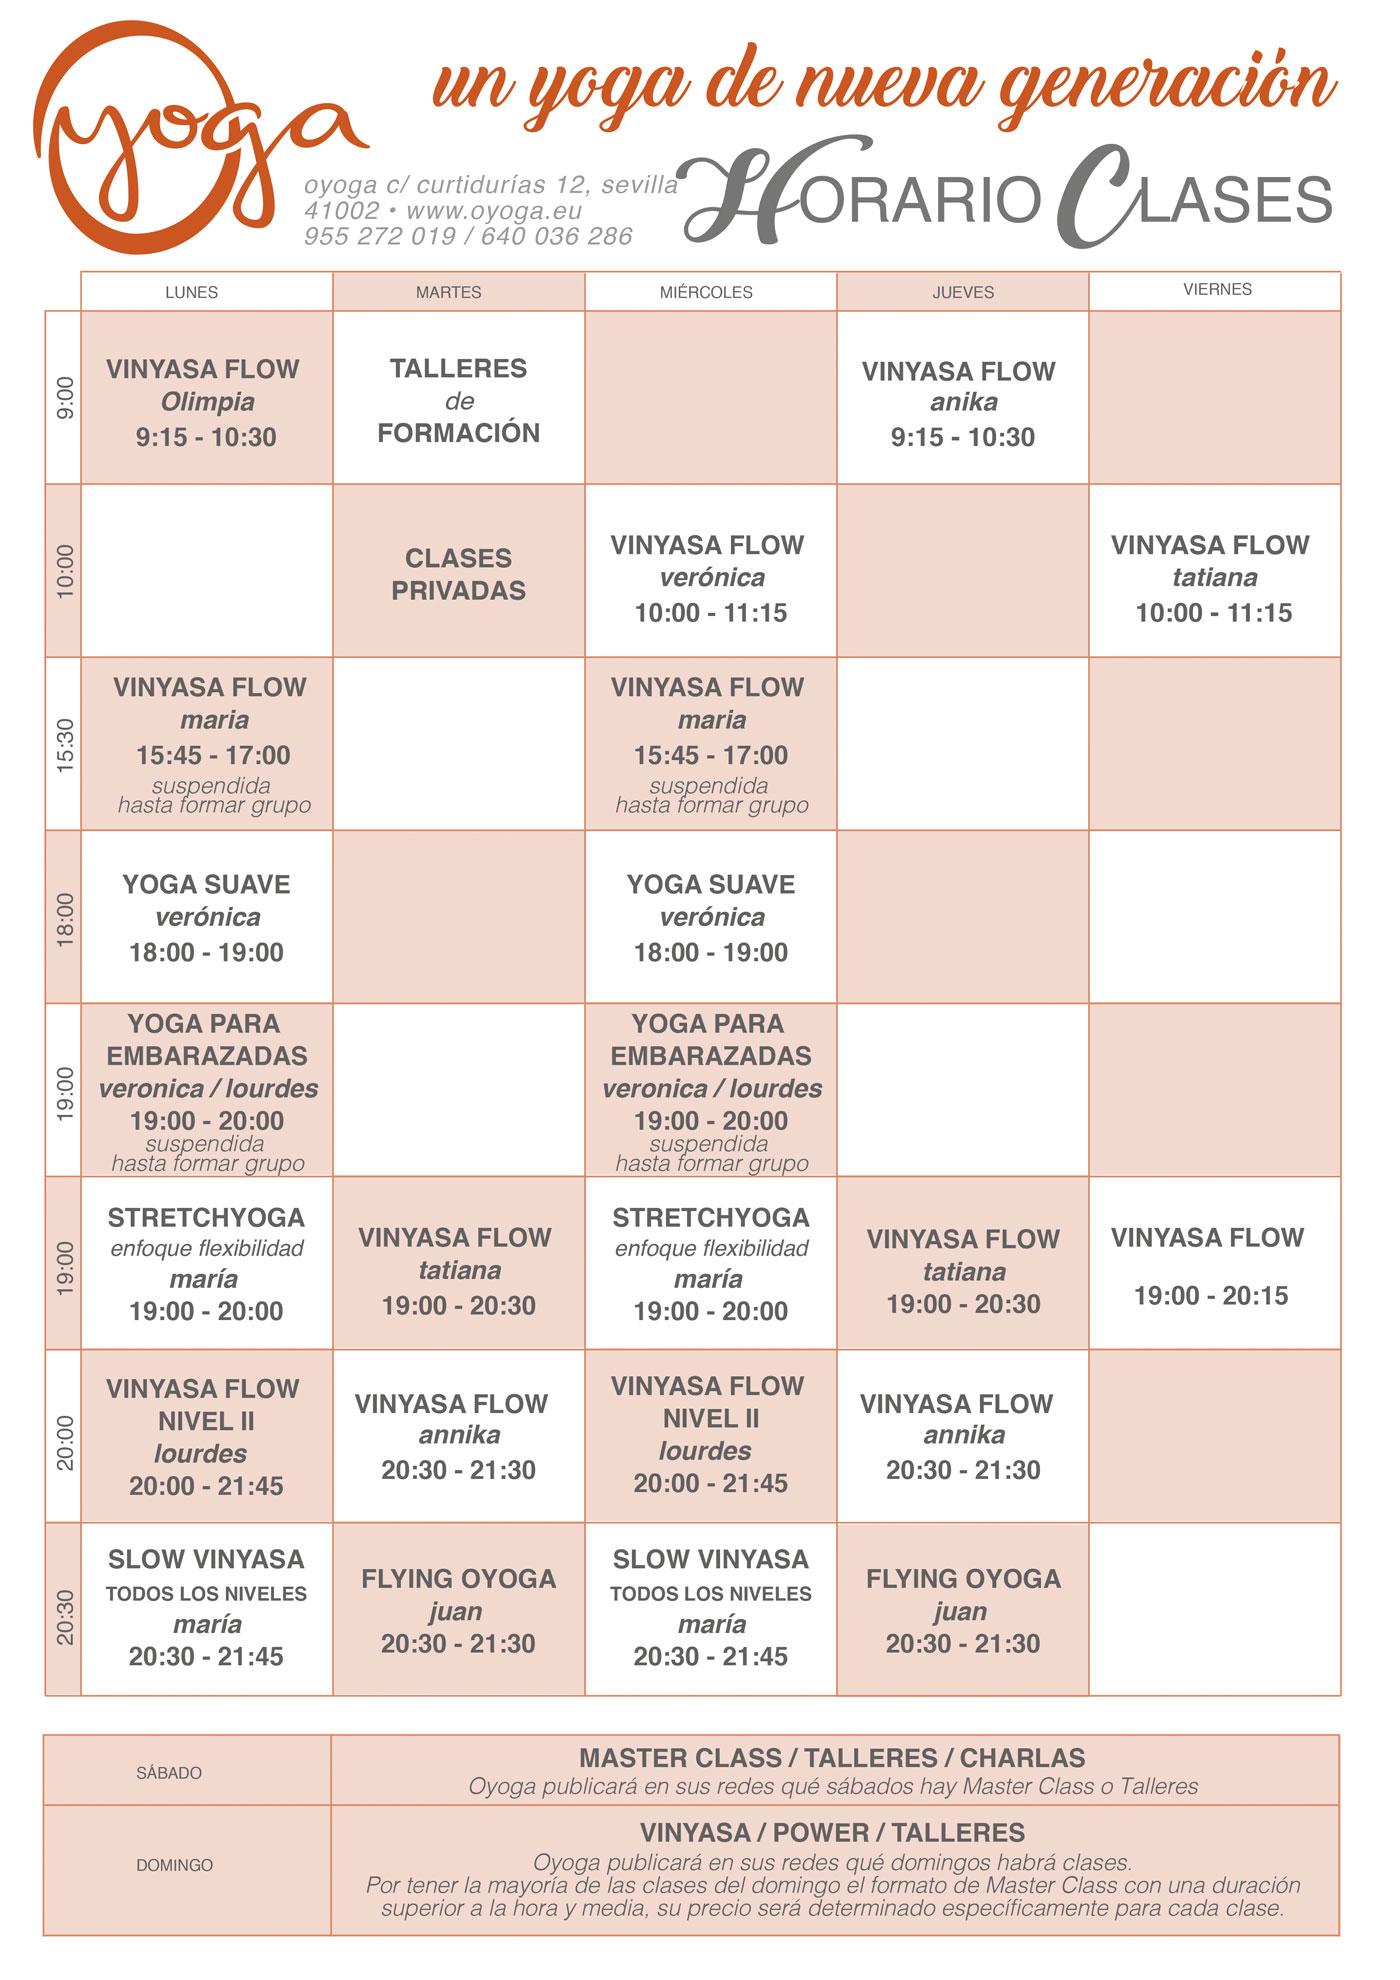 Qyoga horario